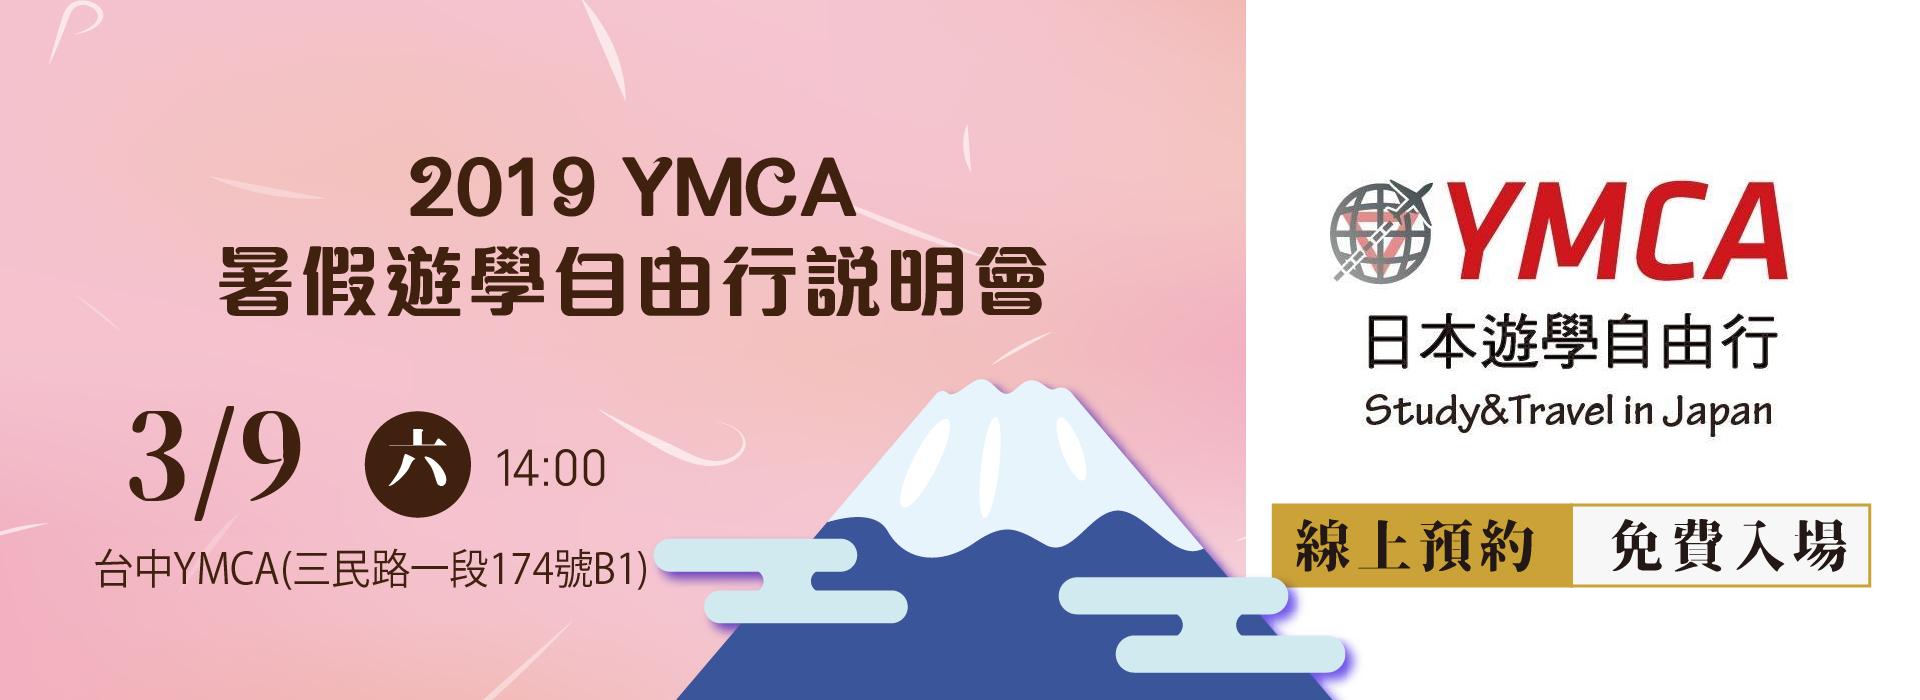 【YMCA2019年春季留學展】台中場2019.03.09下午14:00